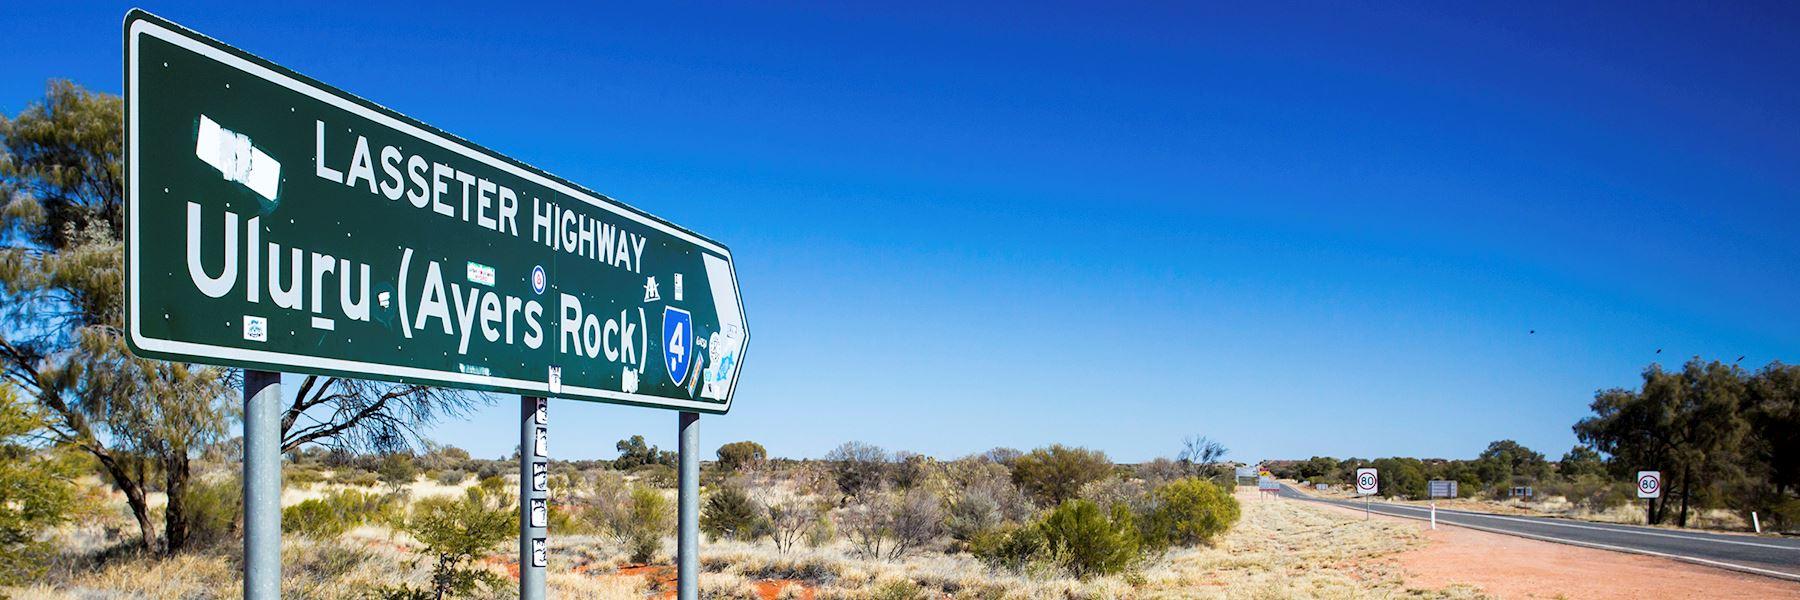 Visit Uluru-Kata Tjuta National Park, Australia